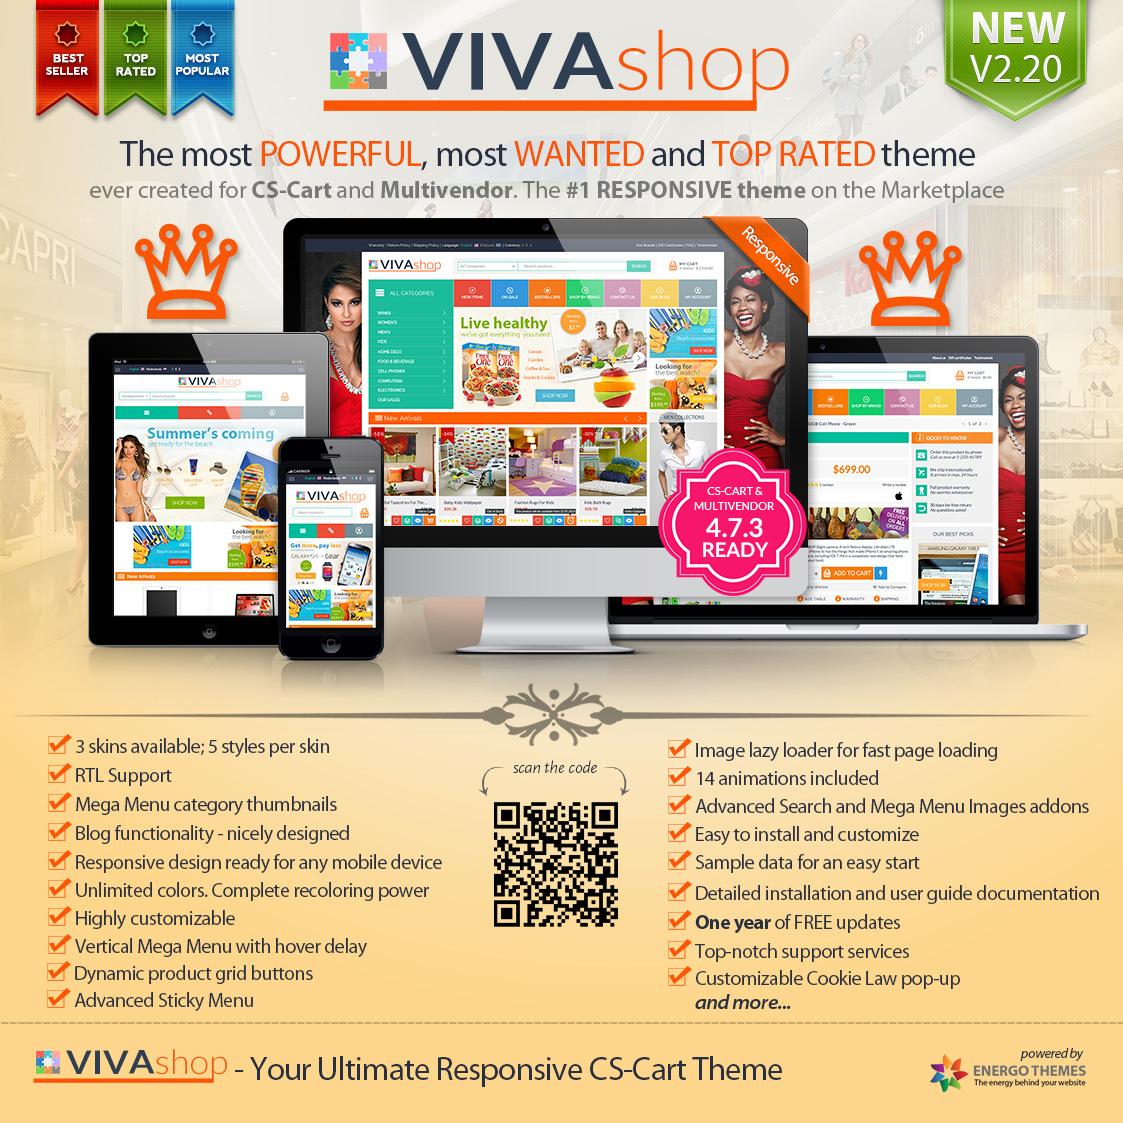 VIVAshop-V2.20-presentation-page-MP.jpg